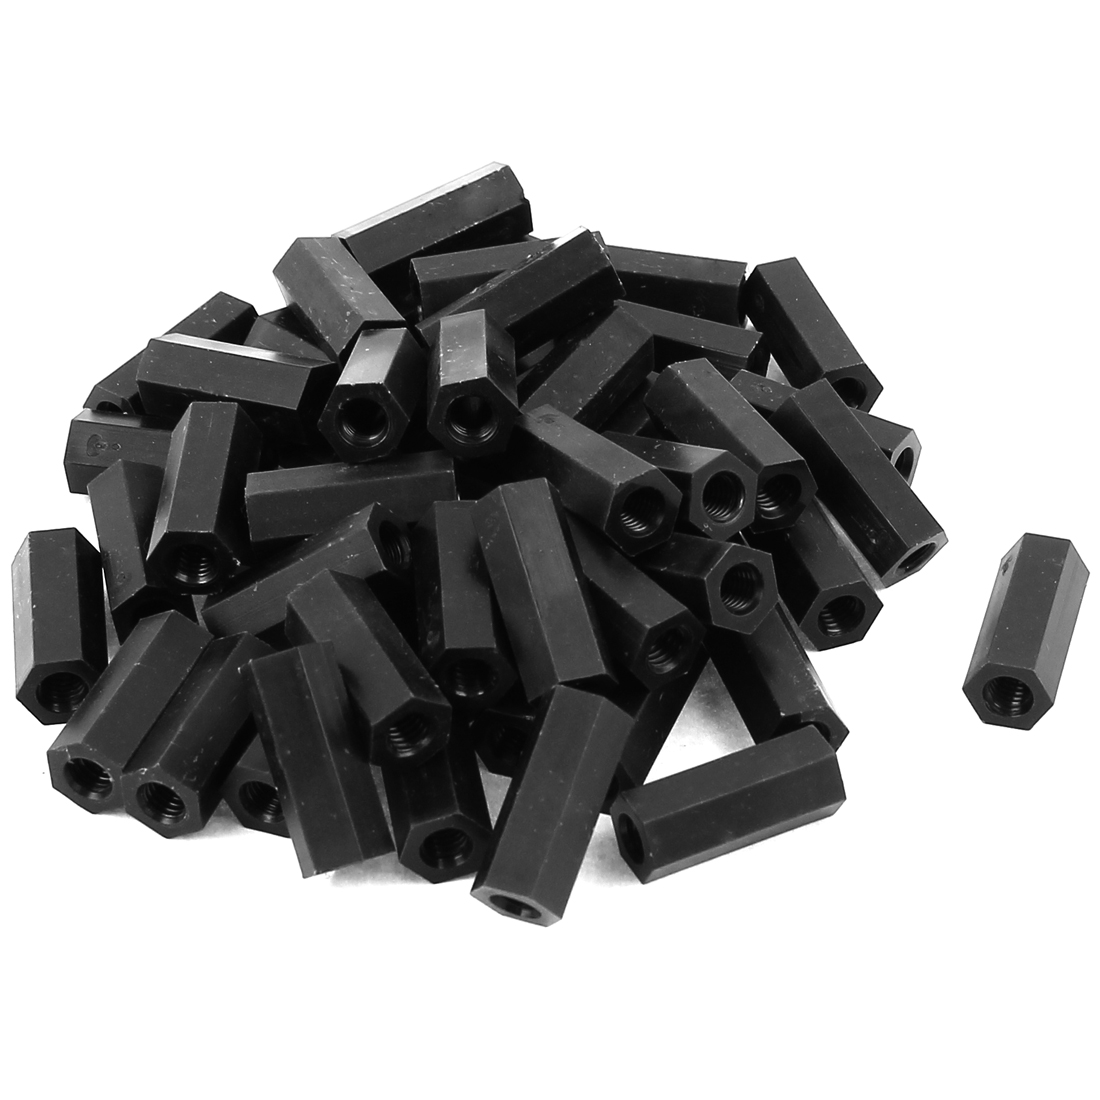 50Pcs M4x18mm Nylon Hex PCB Spacer Standoff Pillar Female Screw Nut Black